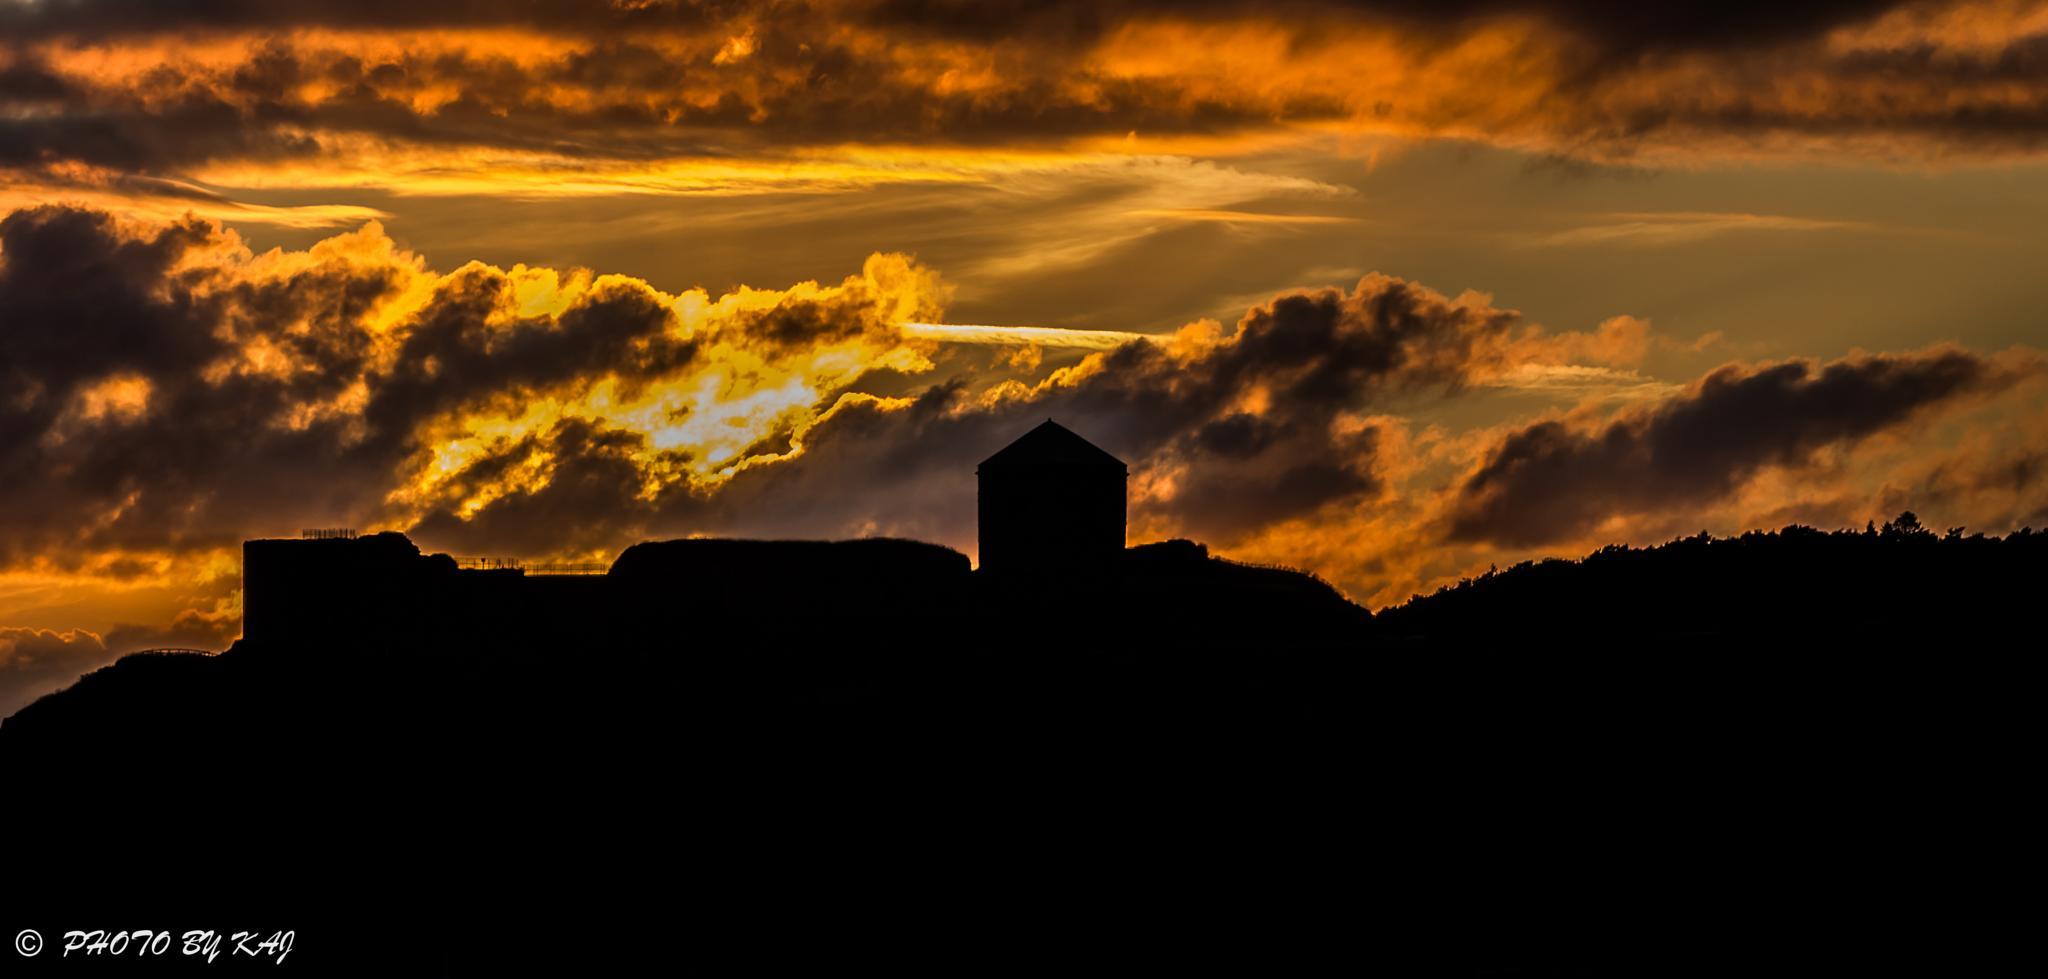 Bohus fortress at evening by kaj.jorgensen.